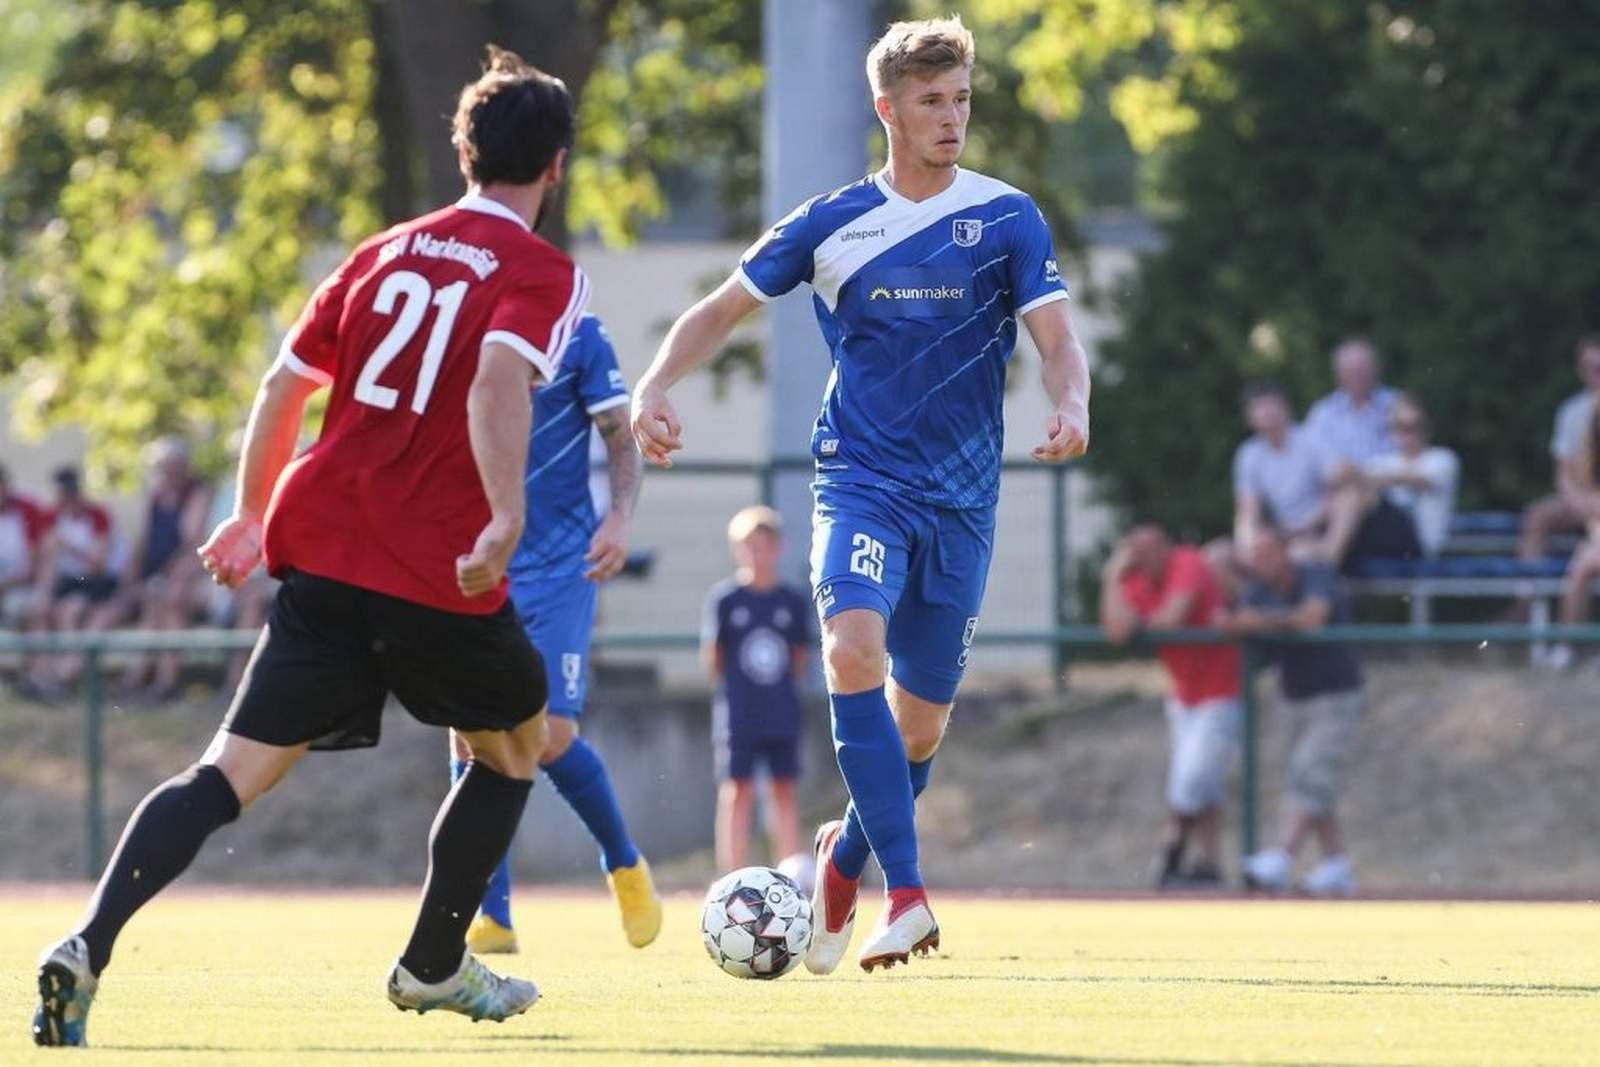 Philipp Harant vom 1. FC Magdeburg